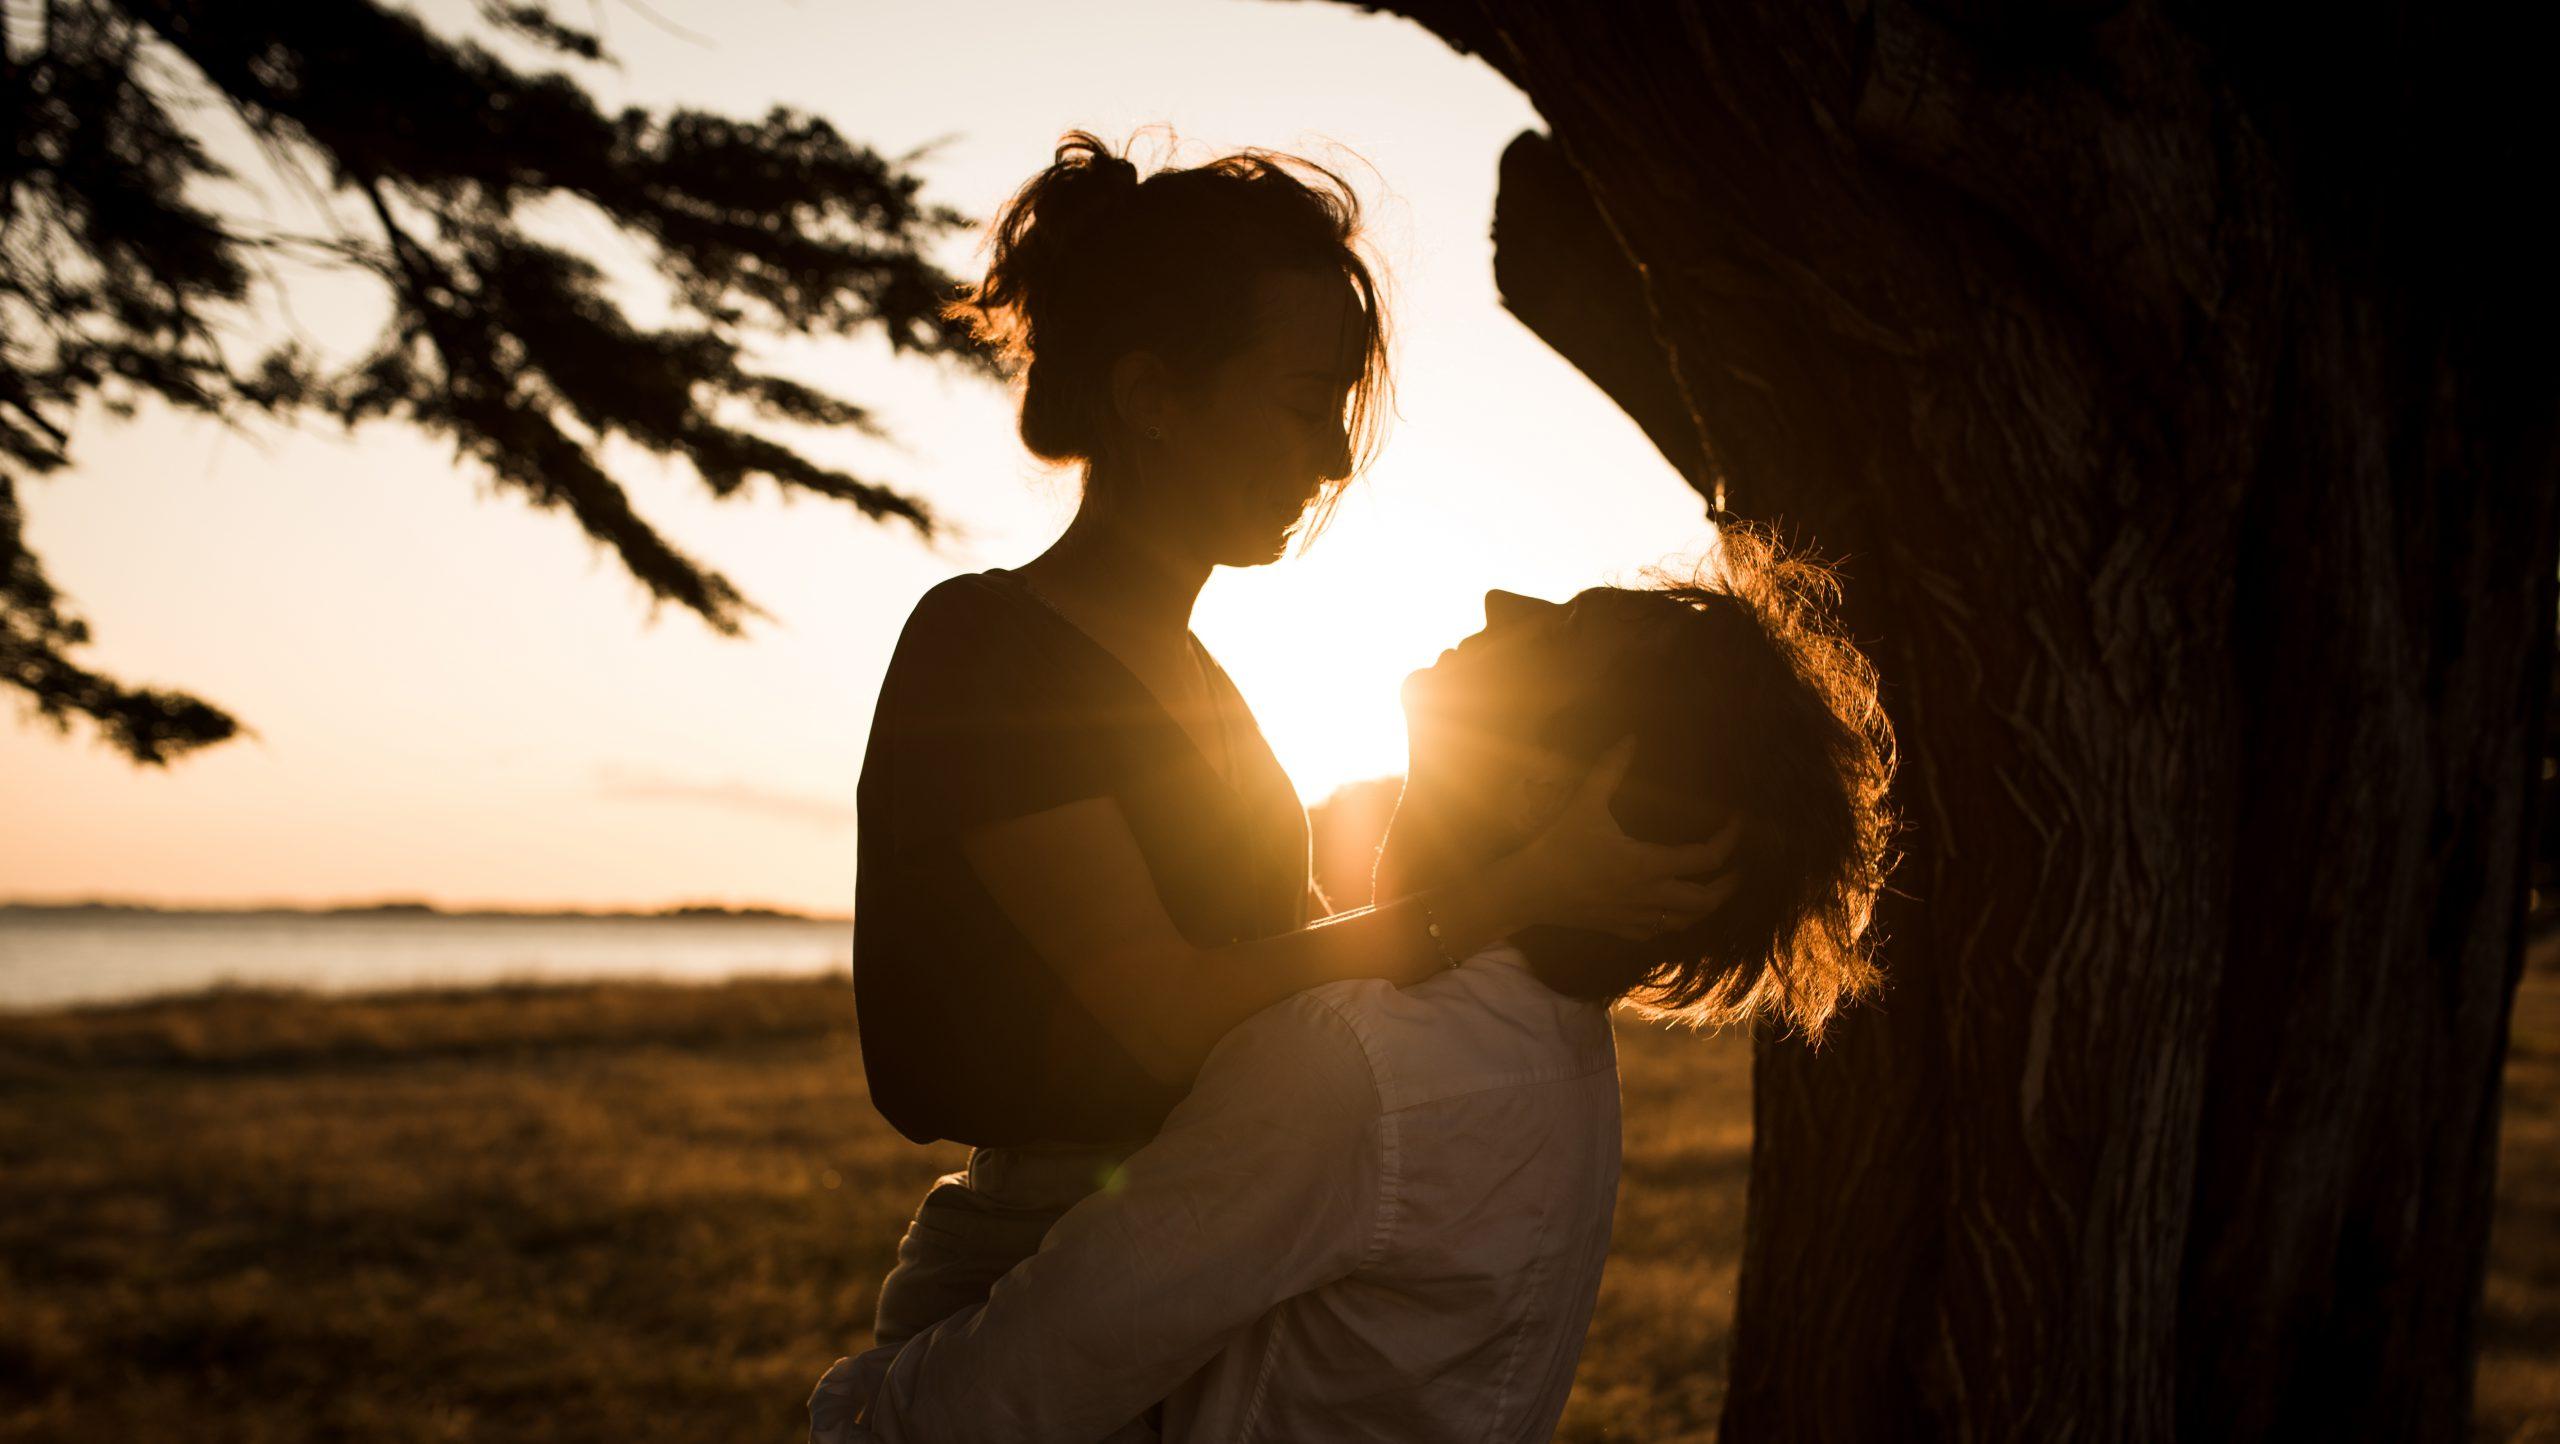 photographe-mariage-rennes-bretagne-saint-malo